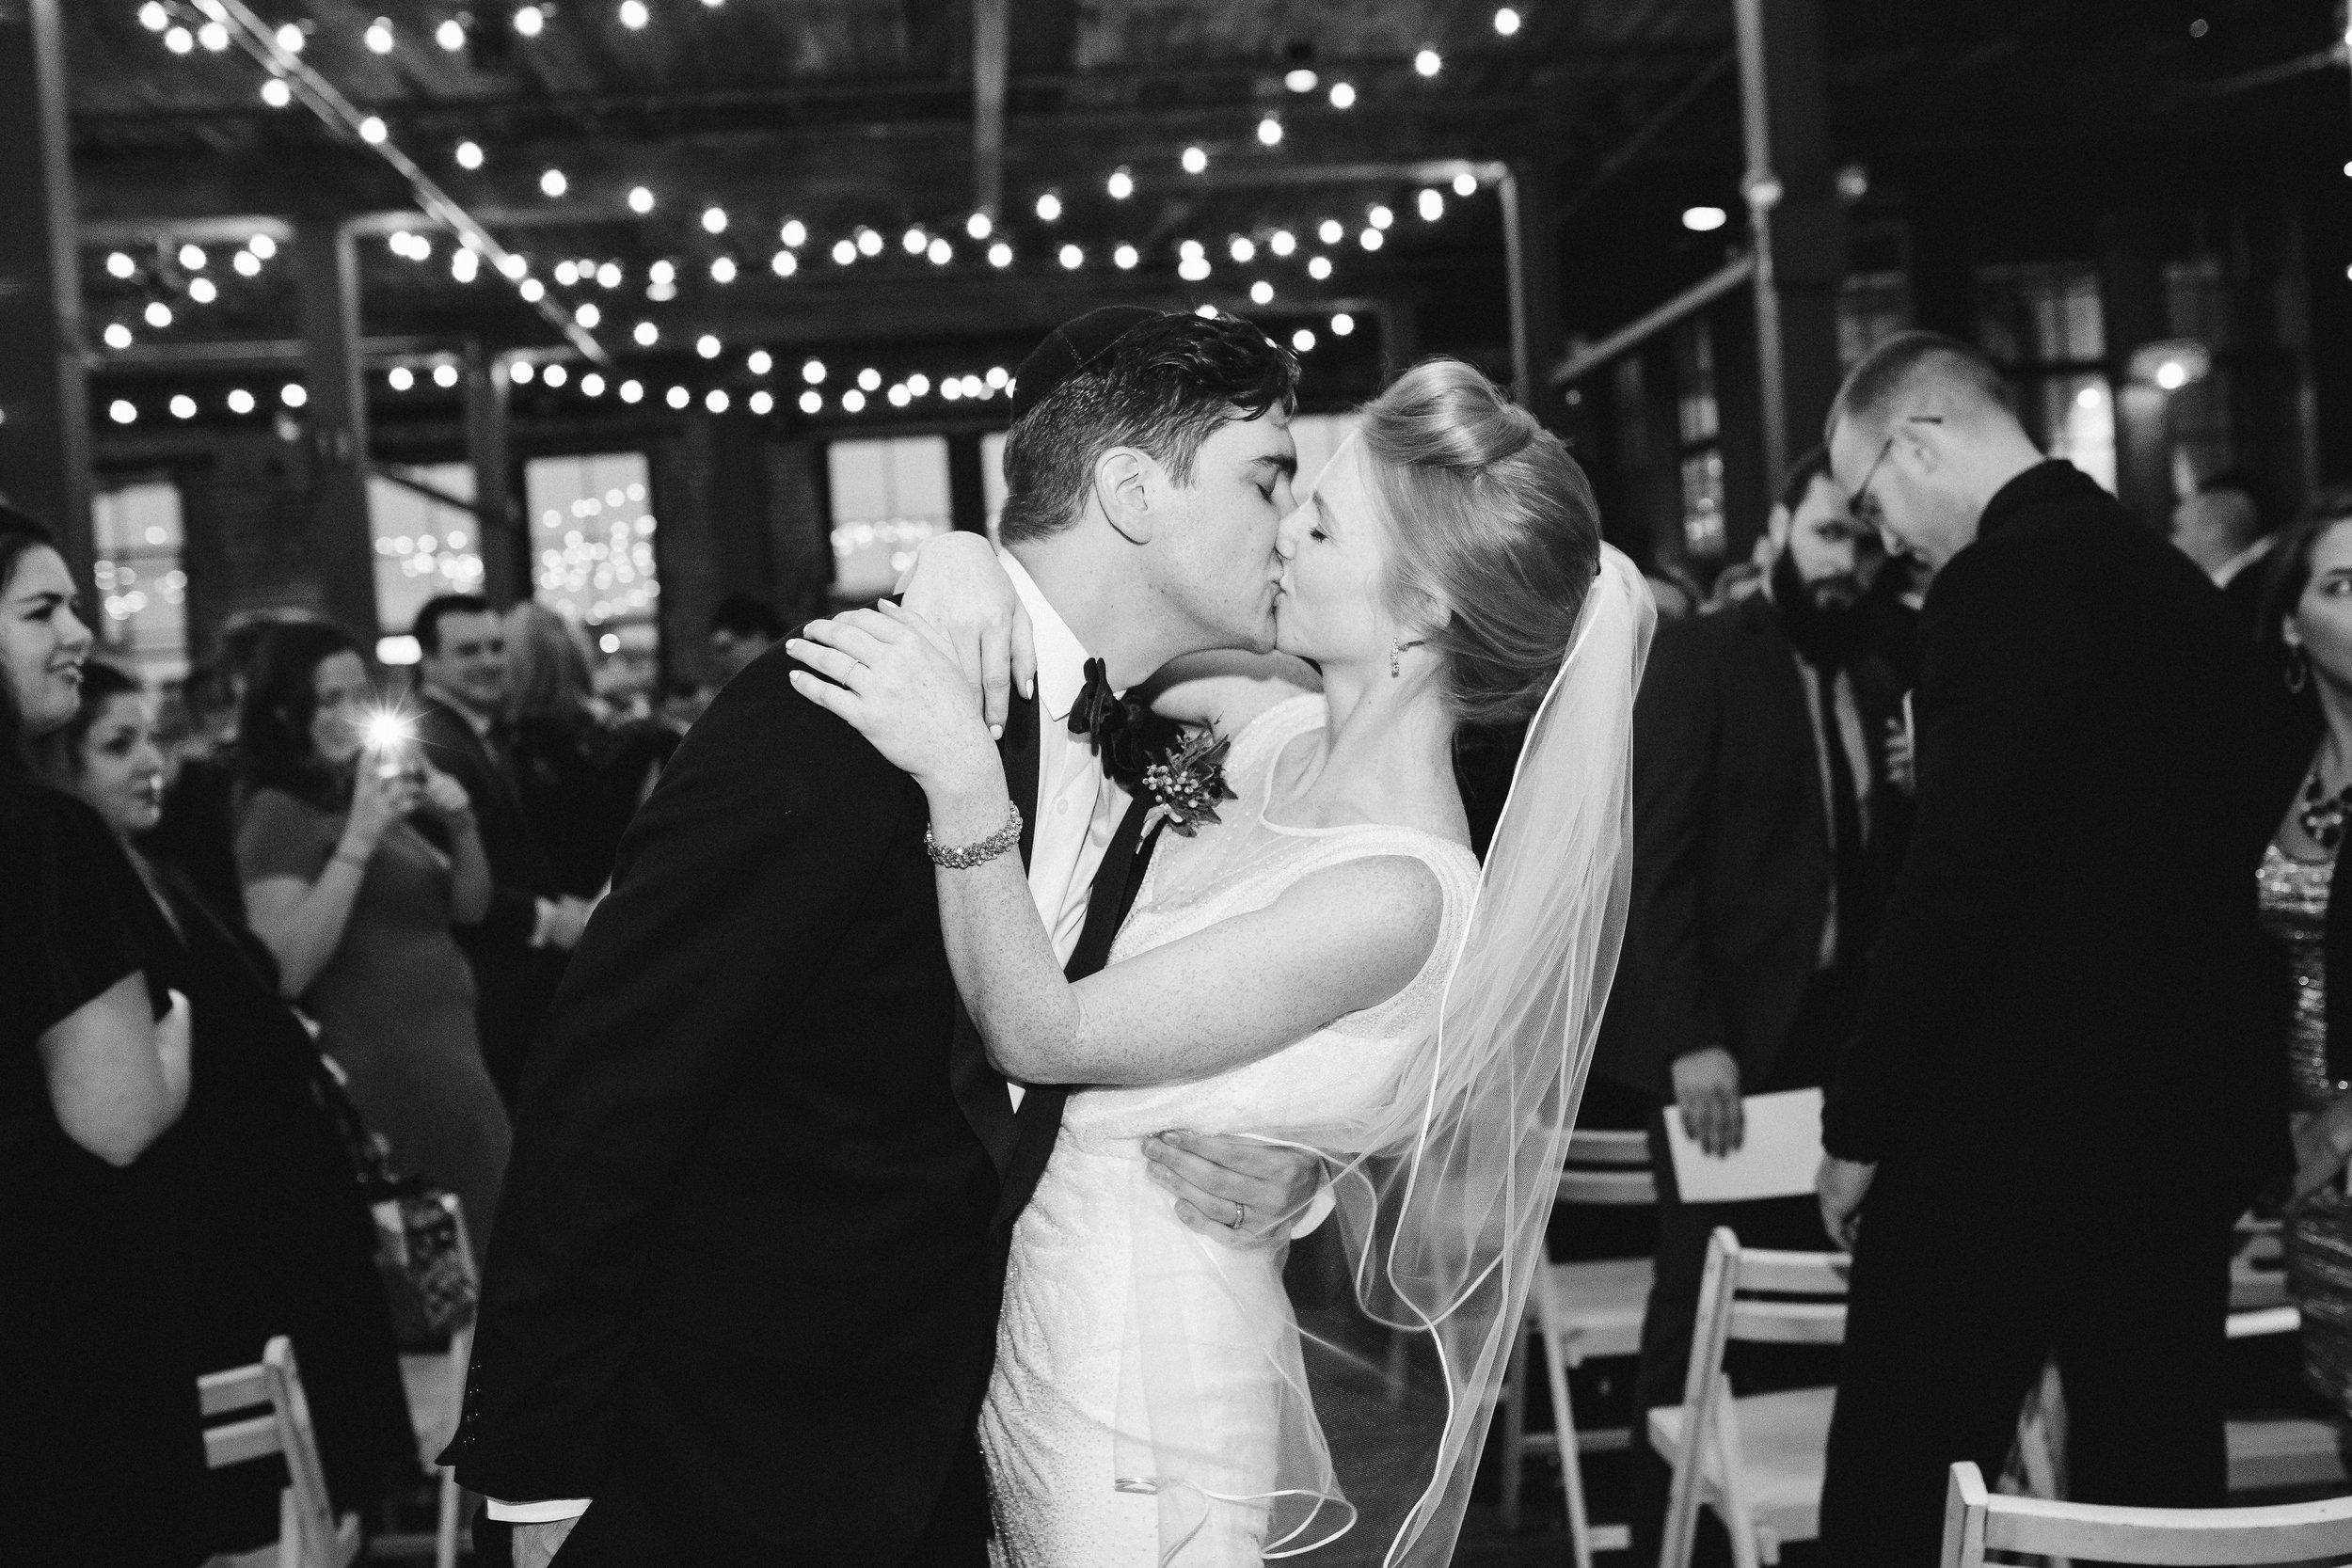 sam-and-jon_metropolitan-building-nyc-wedding-15-6.jpg